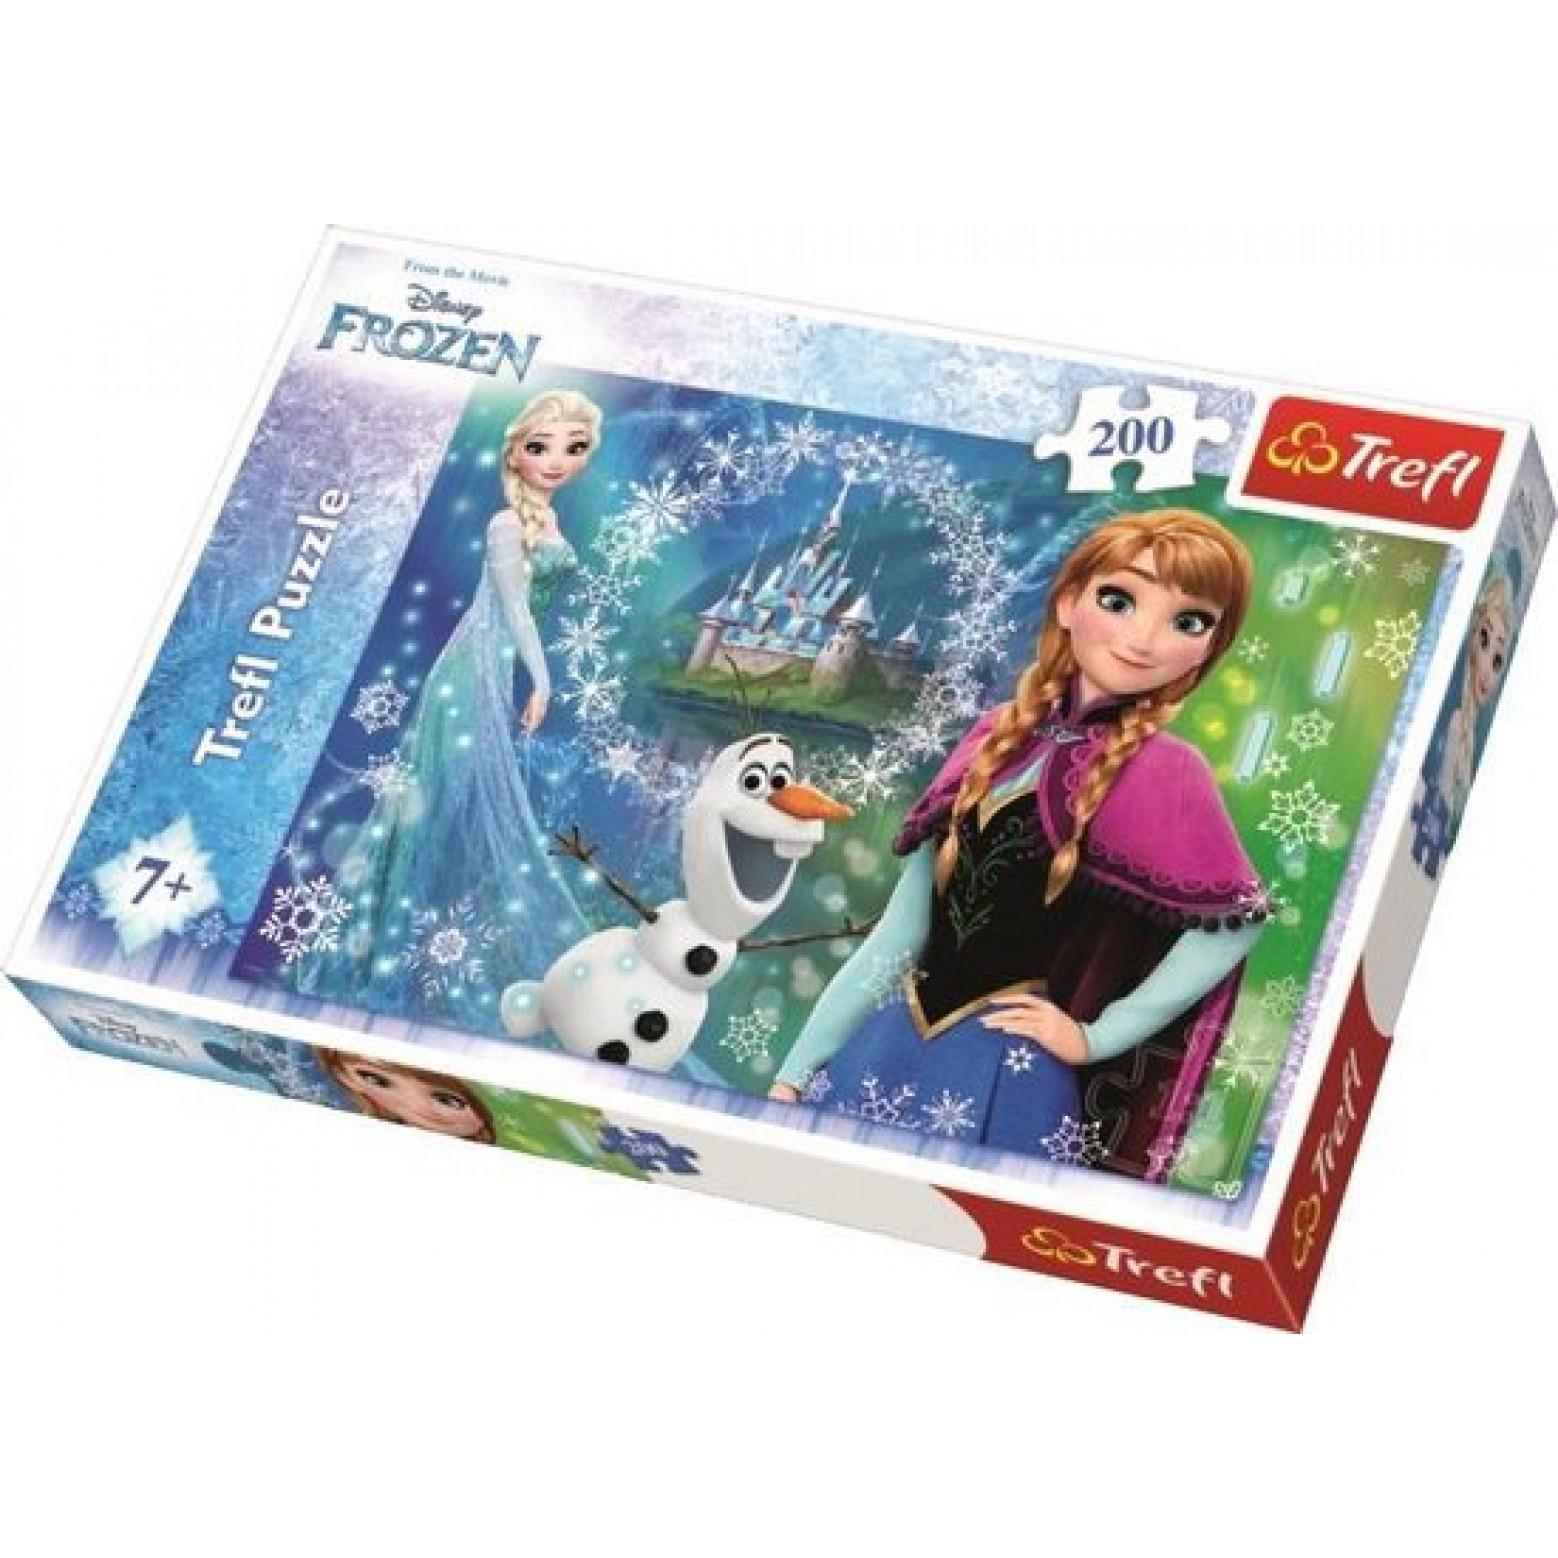 Frozen puzzel 200 stukjes